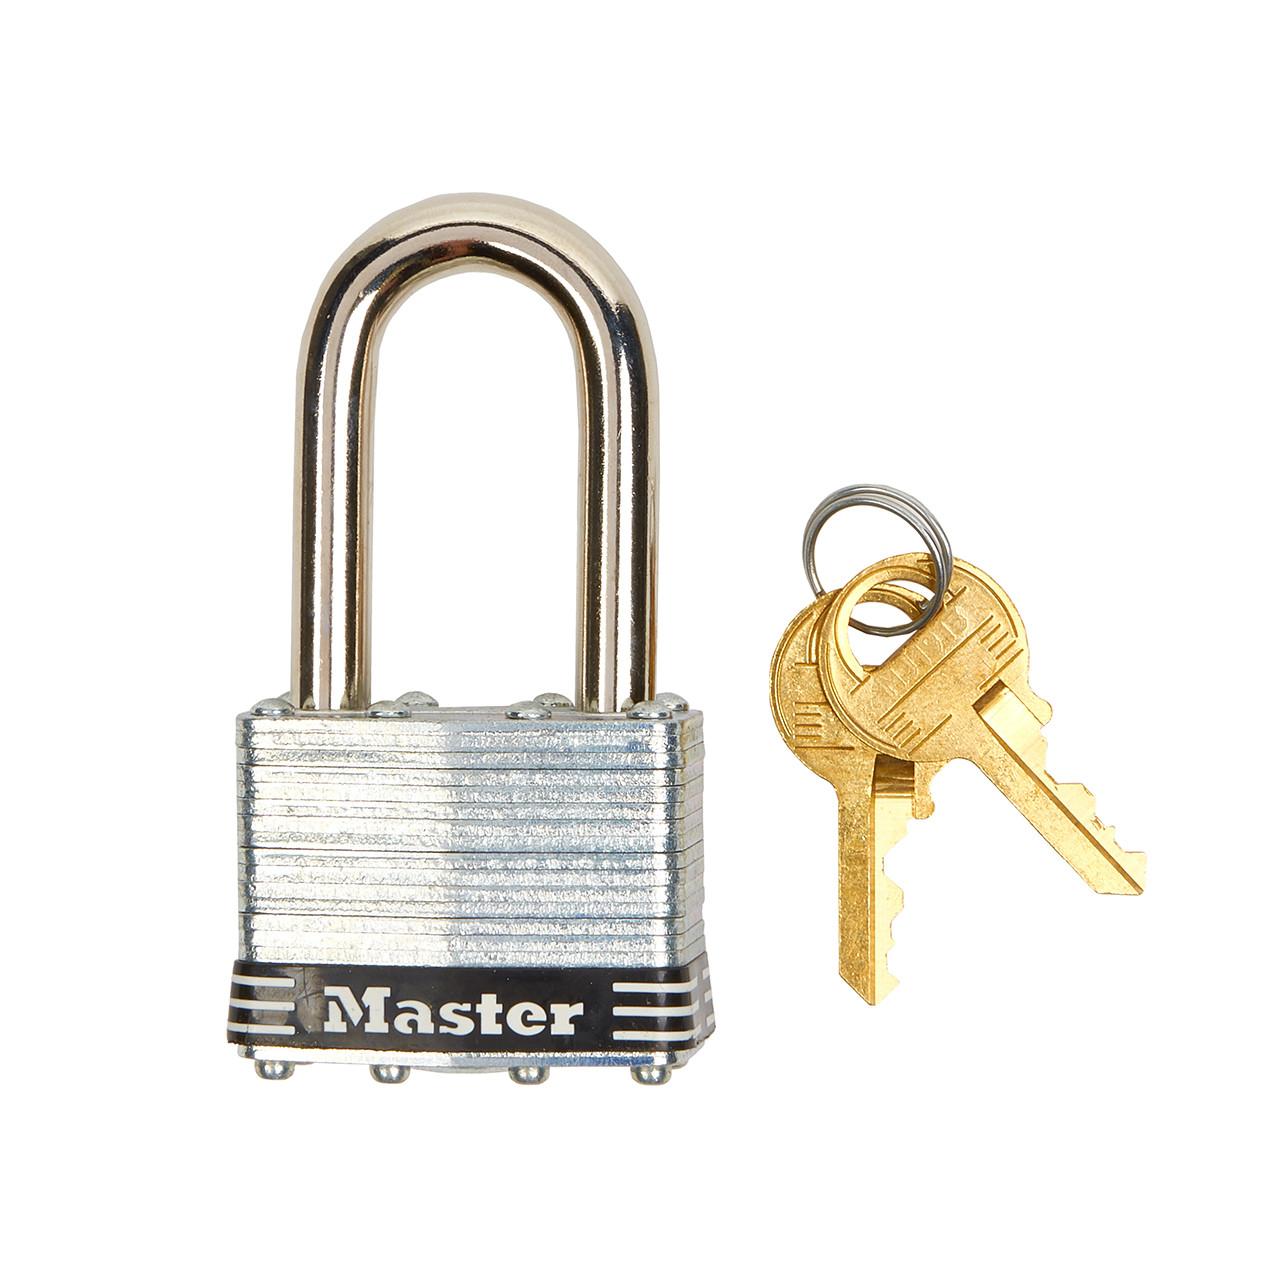 T304 MASTER LOCK PADLOCK